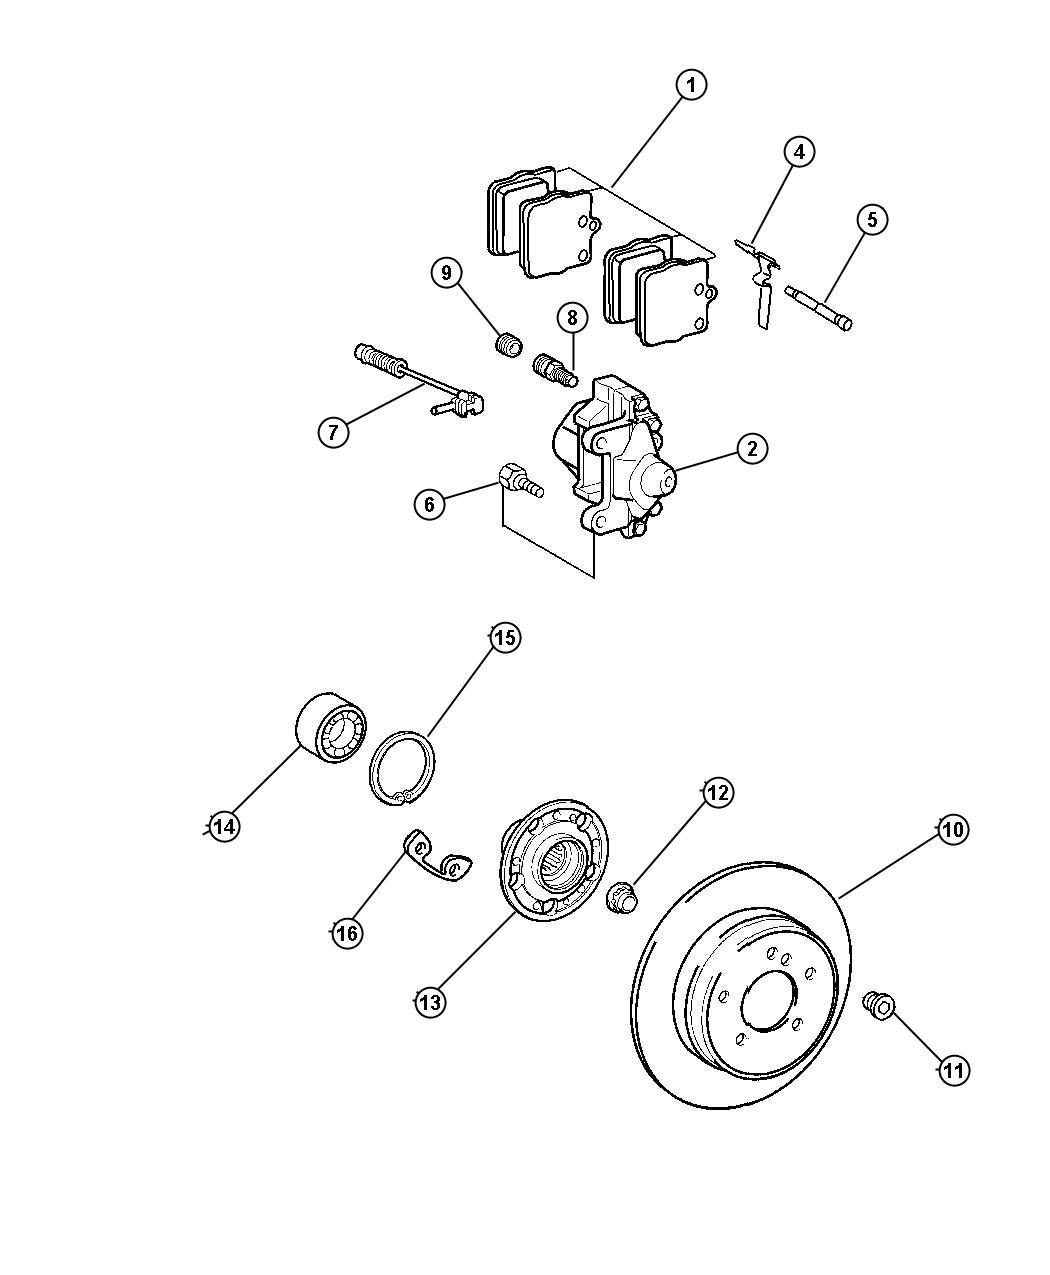 2005 Chrysler Crossfire Screw. M10x23. Rear, brakes, disc